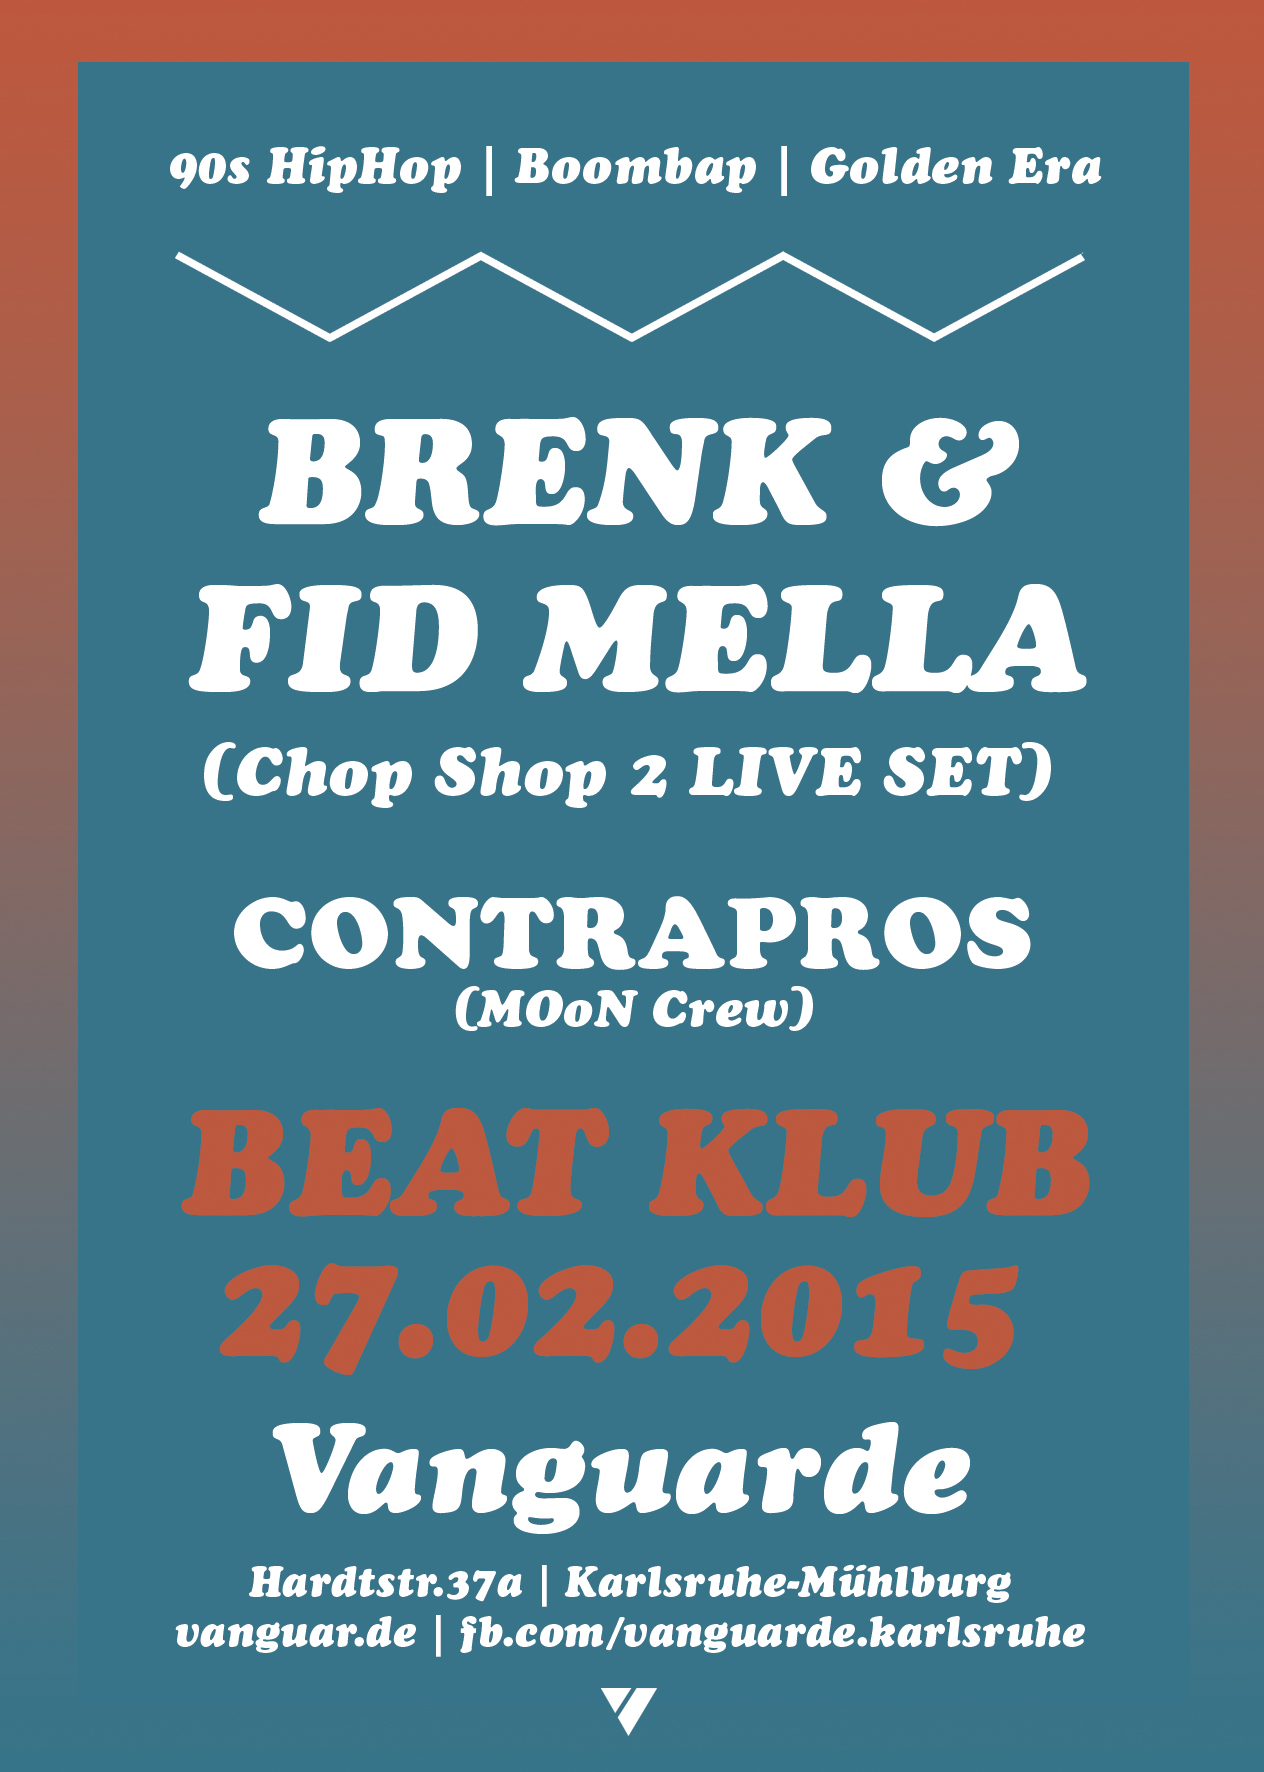 27.02.2015 | Beat Klub mit BRENK SINATRA & FID MELLA (Chop Shop 2 Live Set)